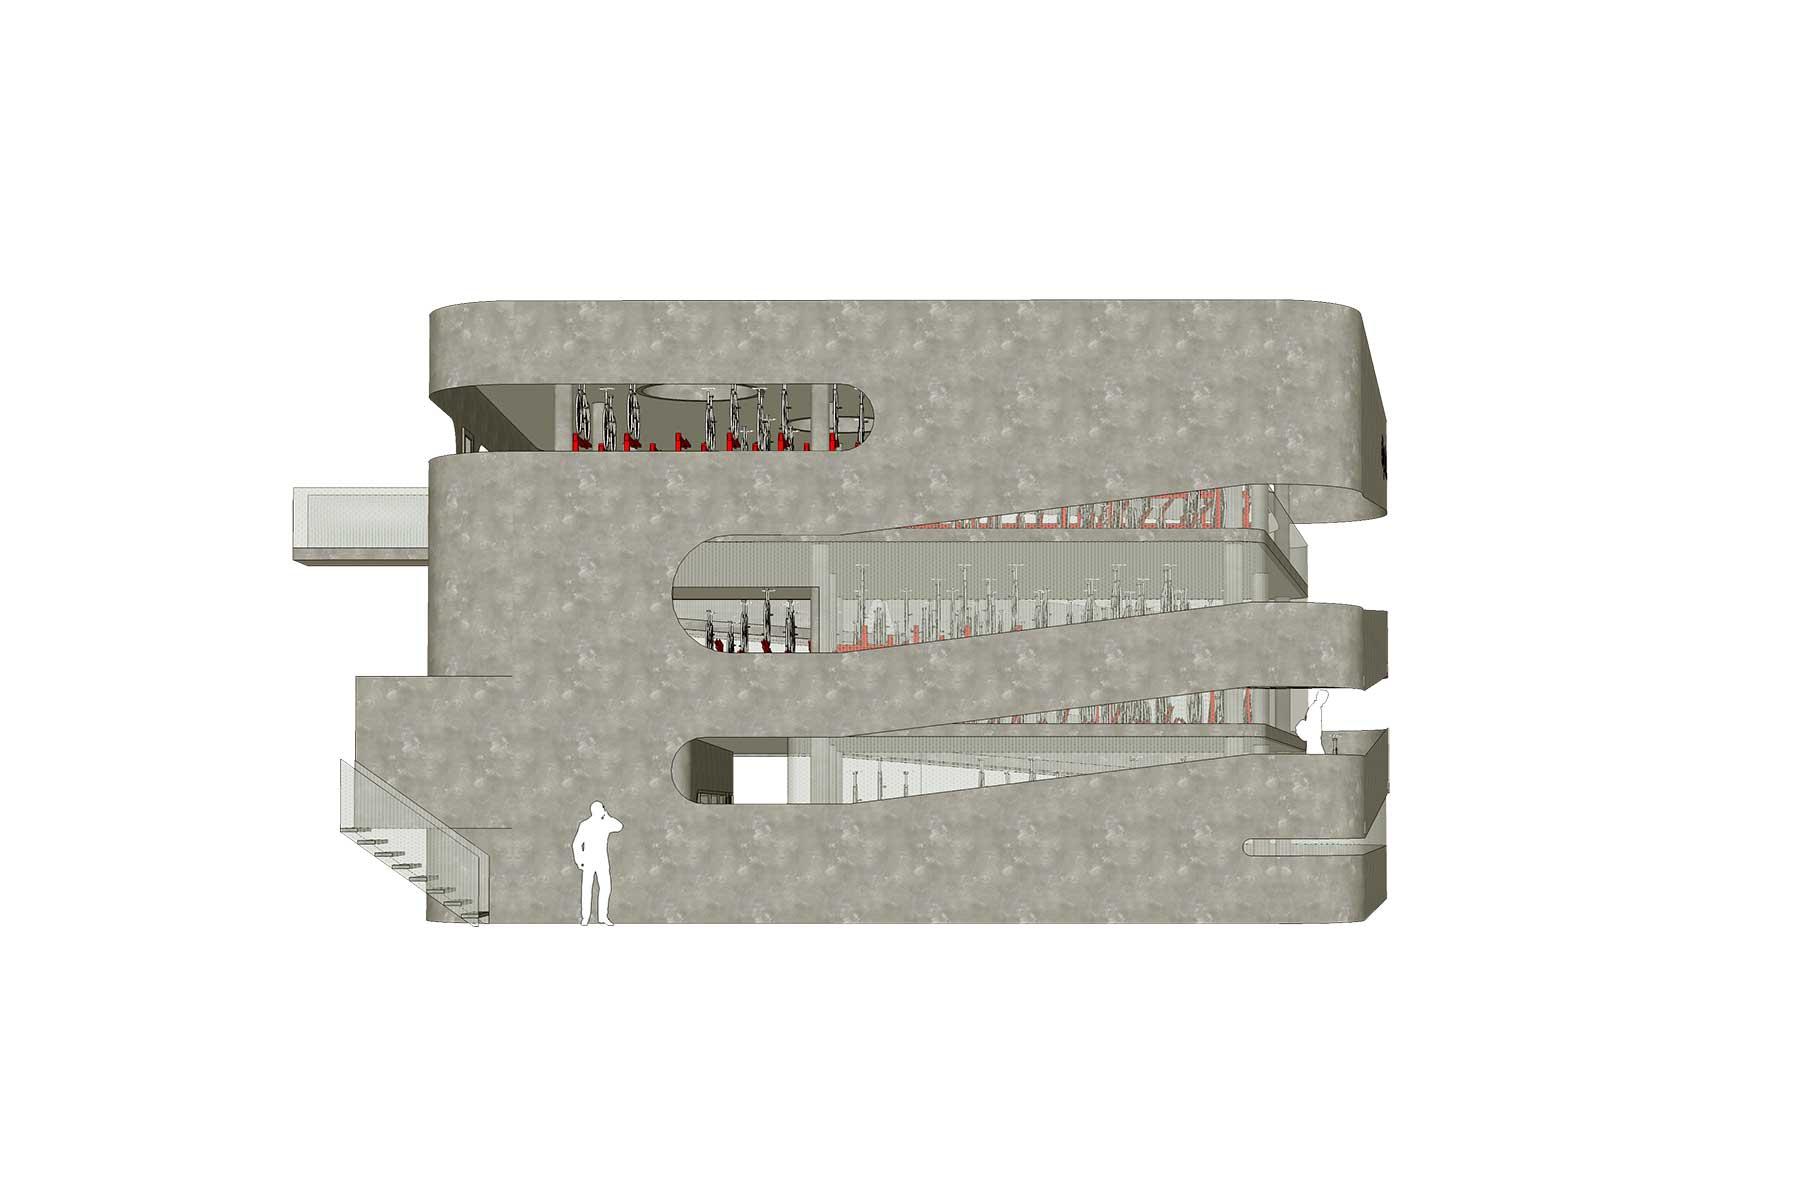 8A-Architecten-city-stal-nieuwegein-14